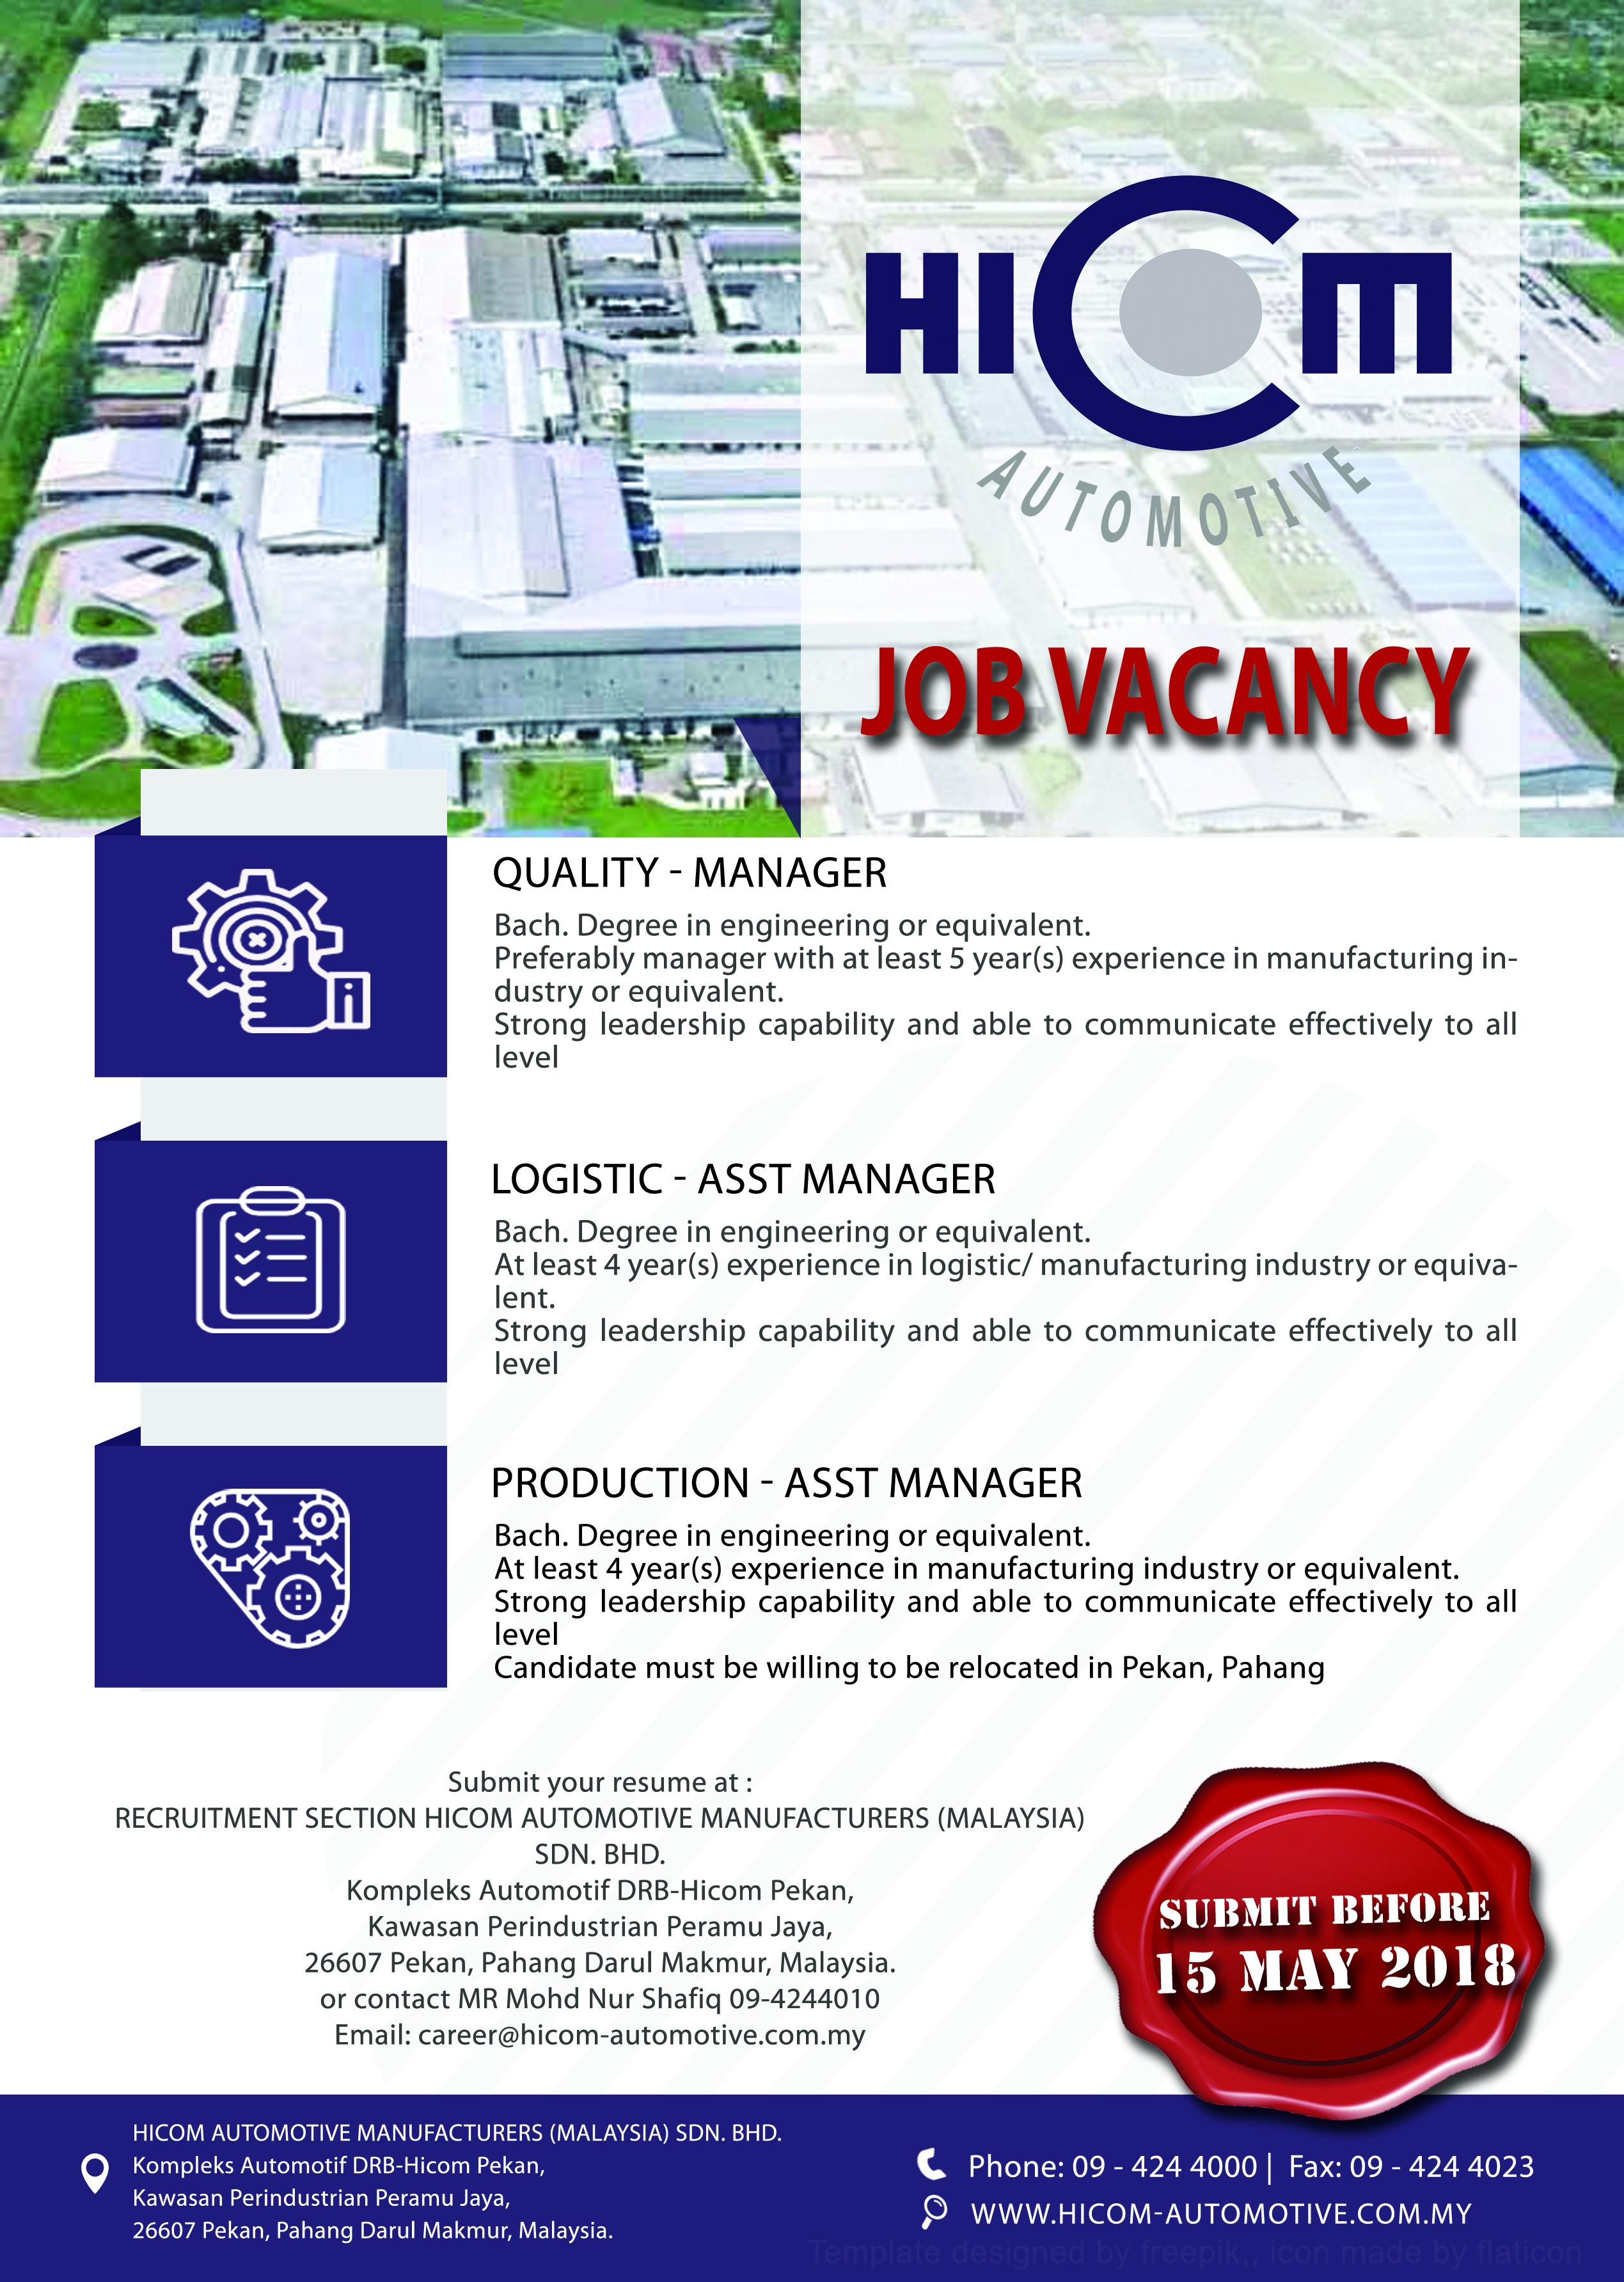 HICOM Automotive Manufacturers (Malaysia) Sdn  Bhd